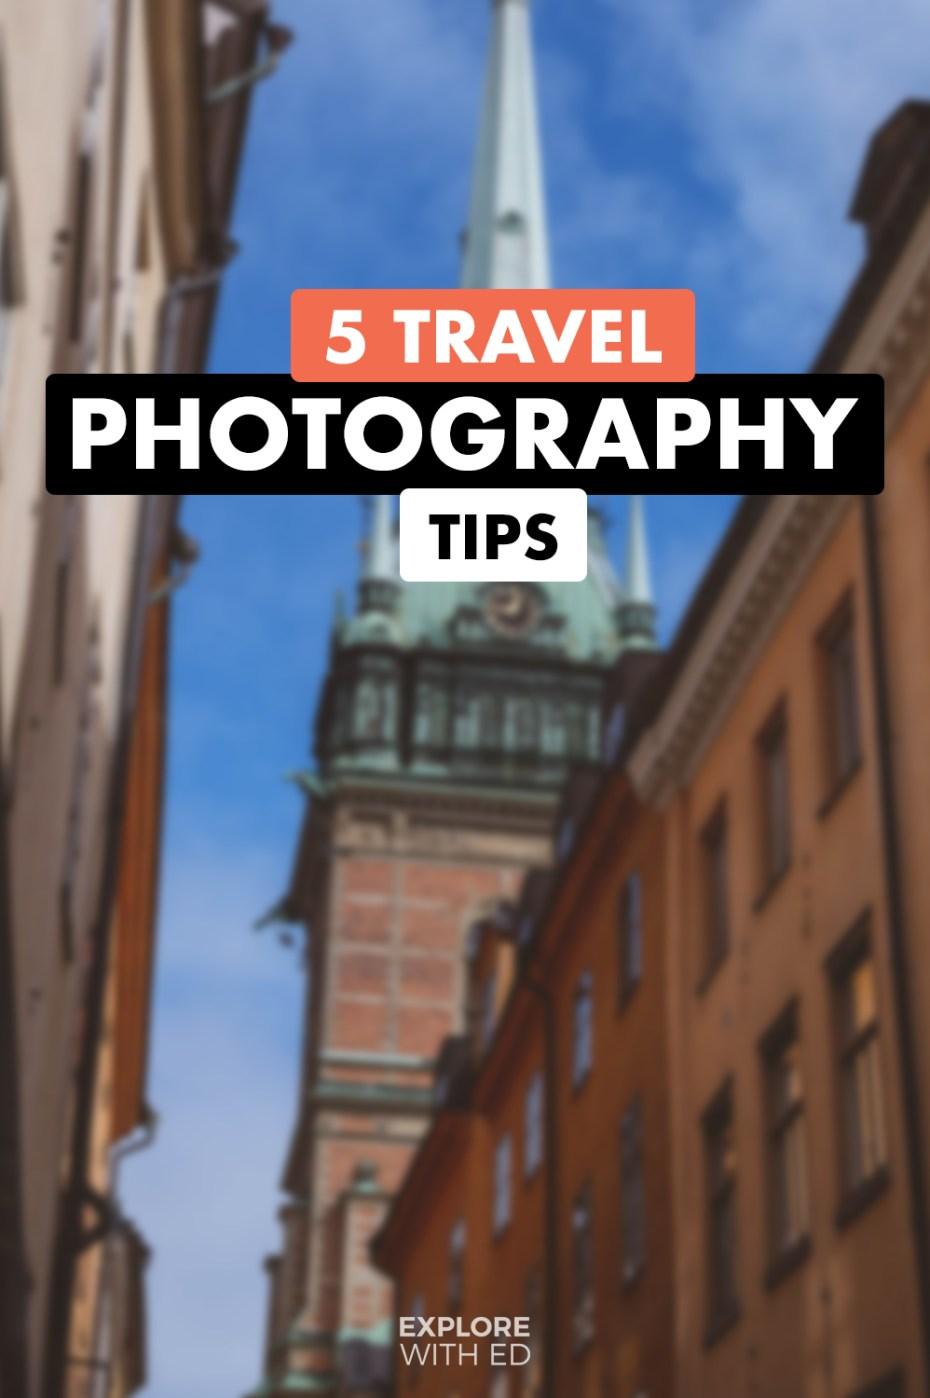 Travel photography tips, TikTok format tips